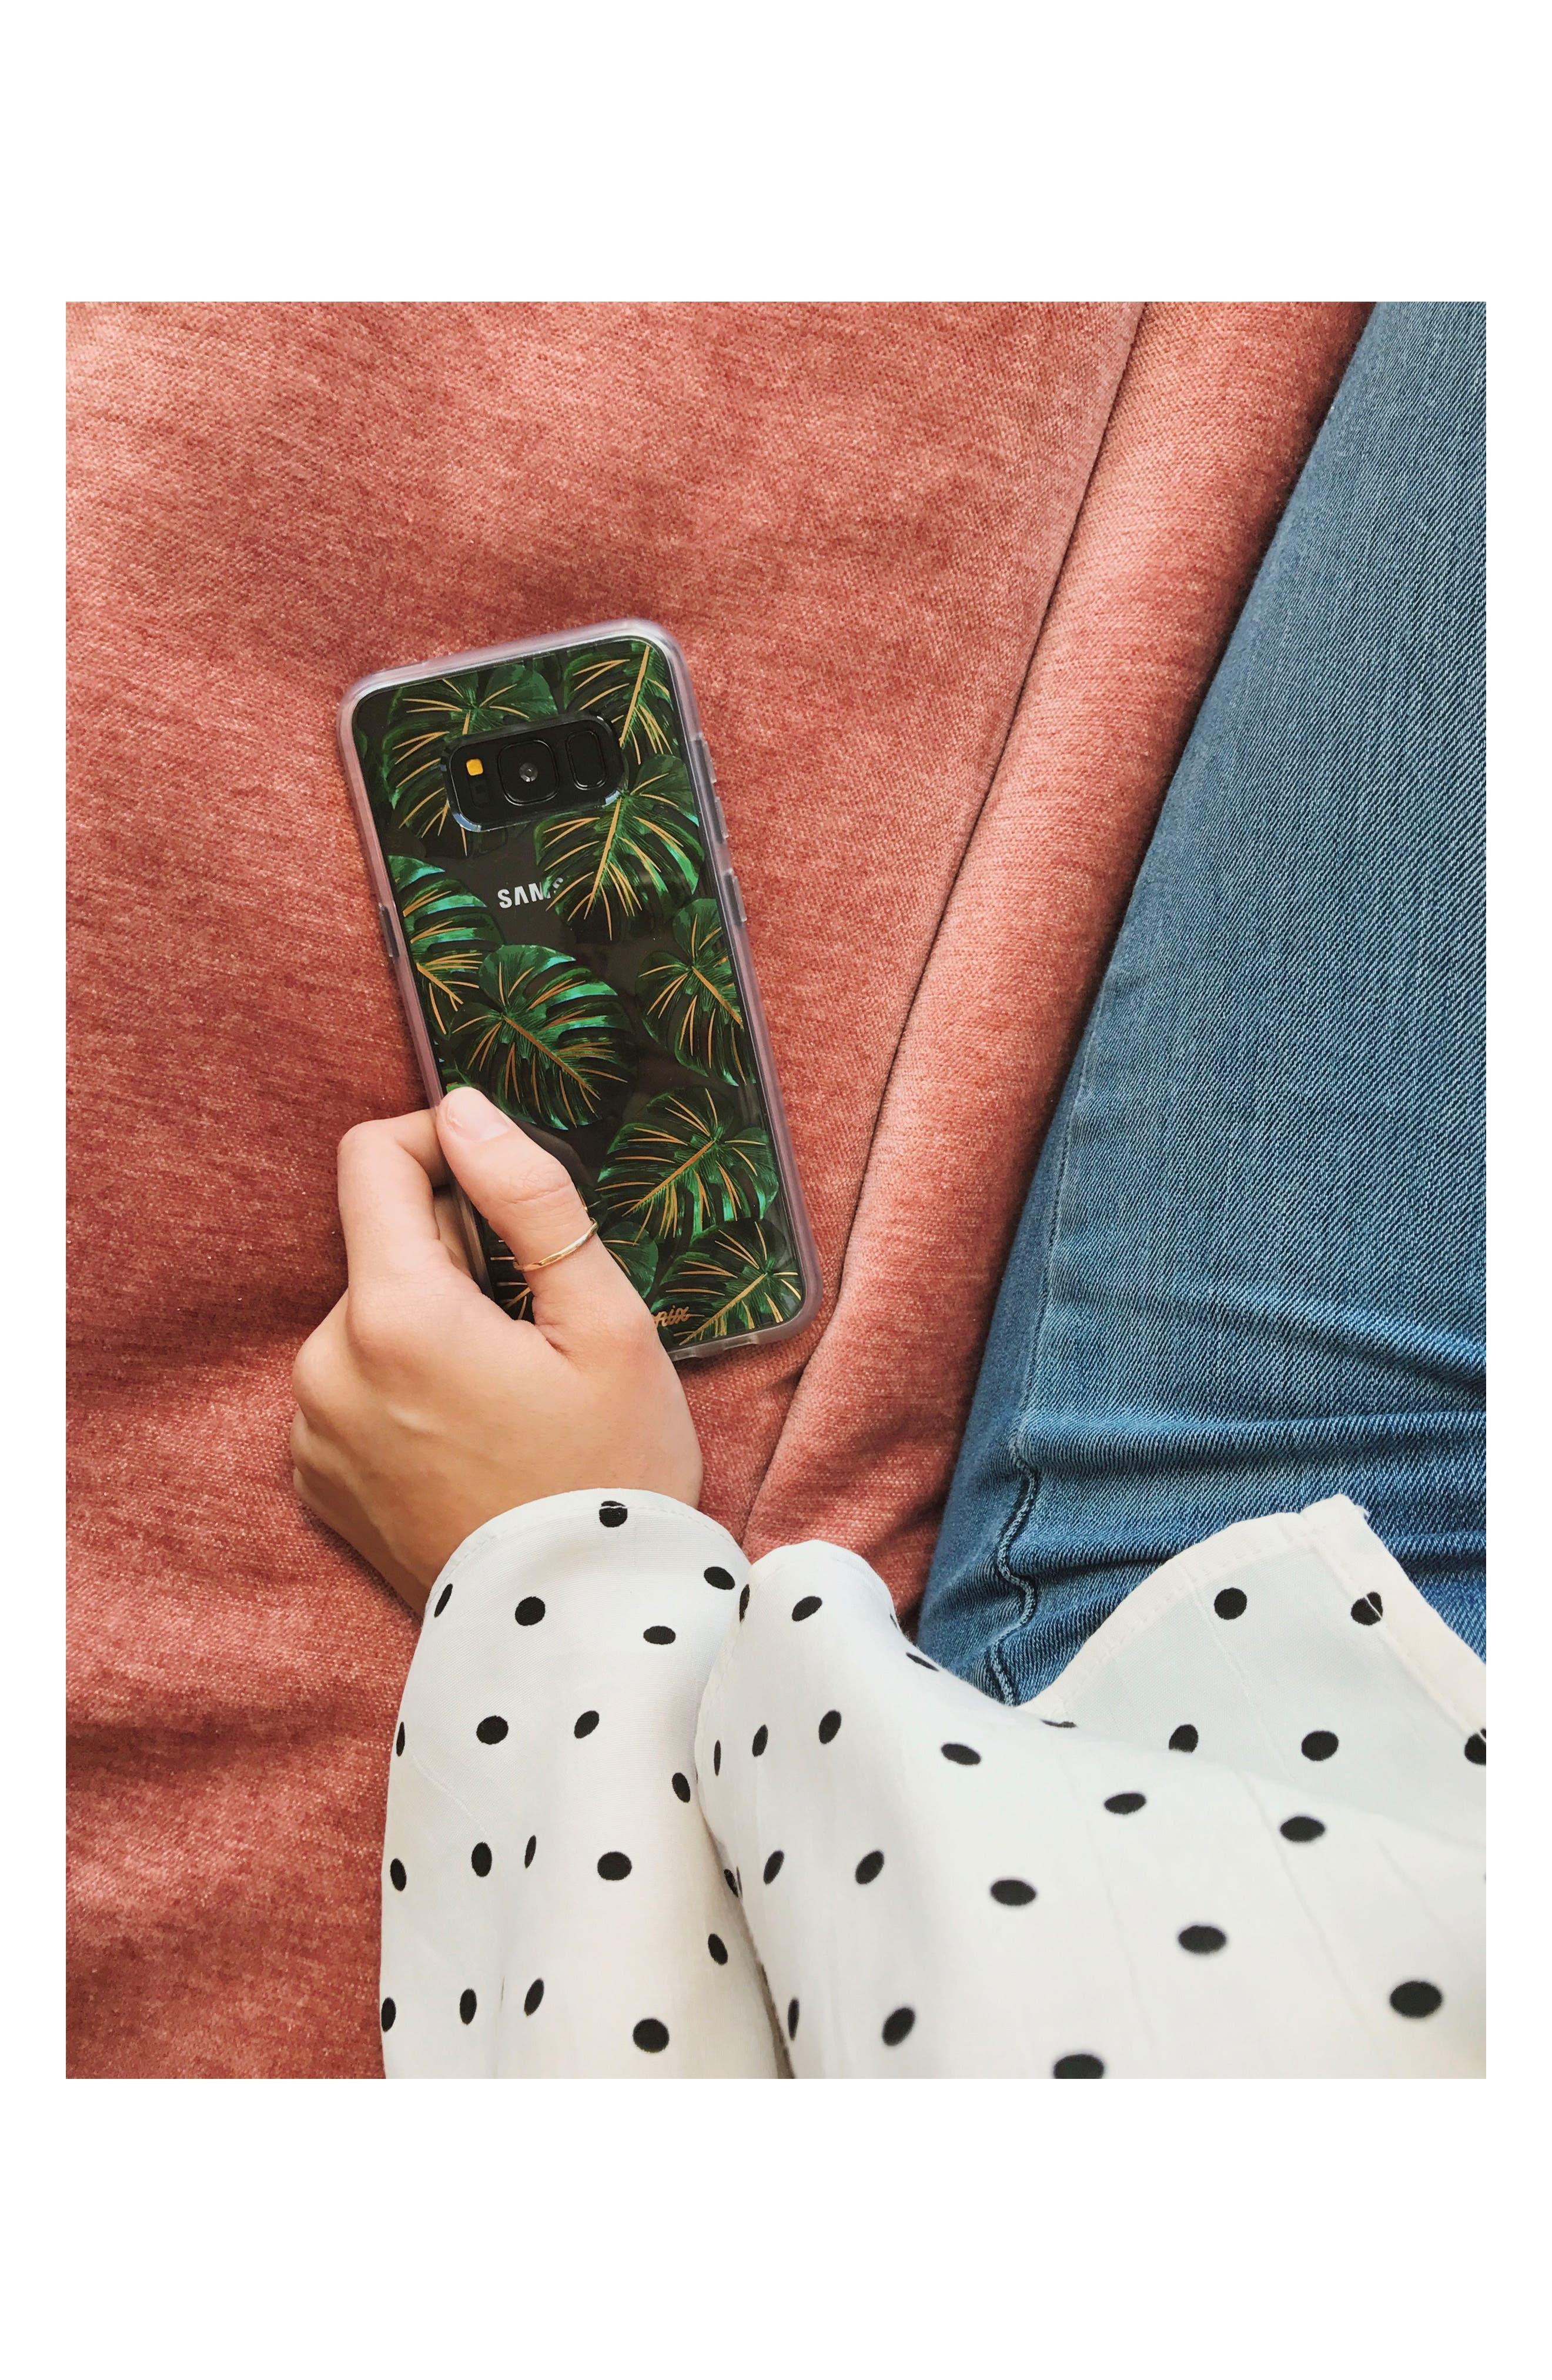 Tamarindo Samsung Galaxy S8 & Galaxy S8 Plus Case,                             Alternate thumbnail 3, color,                             Green